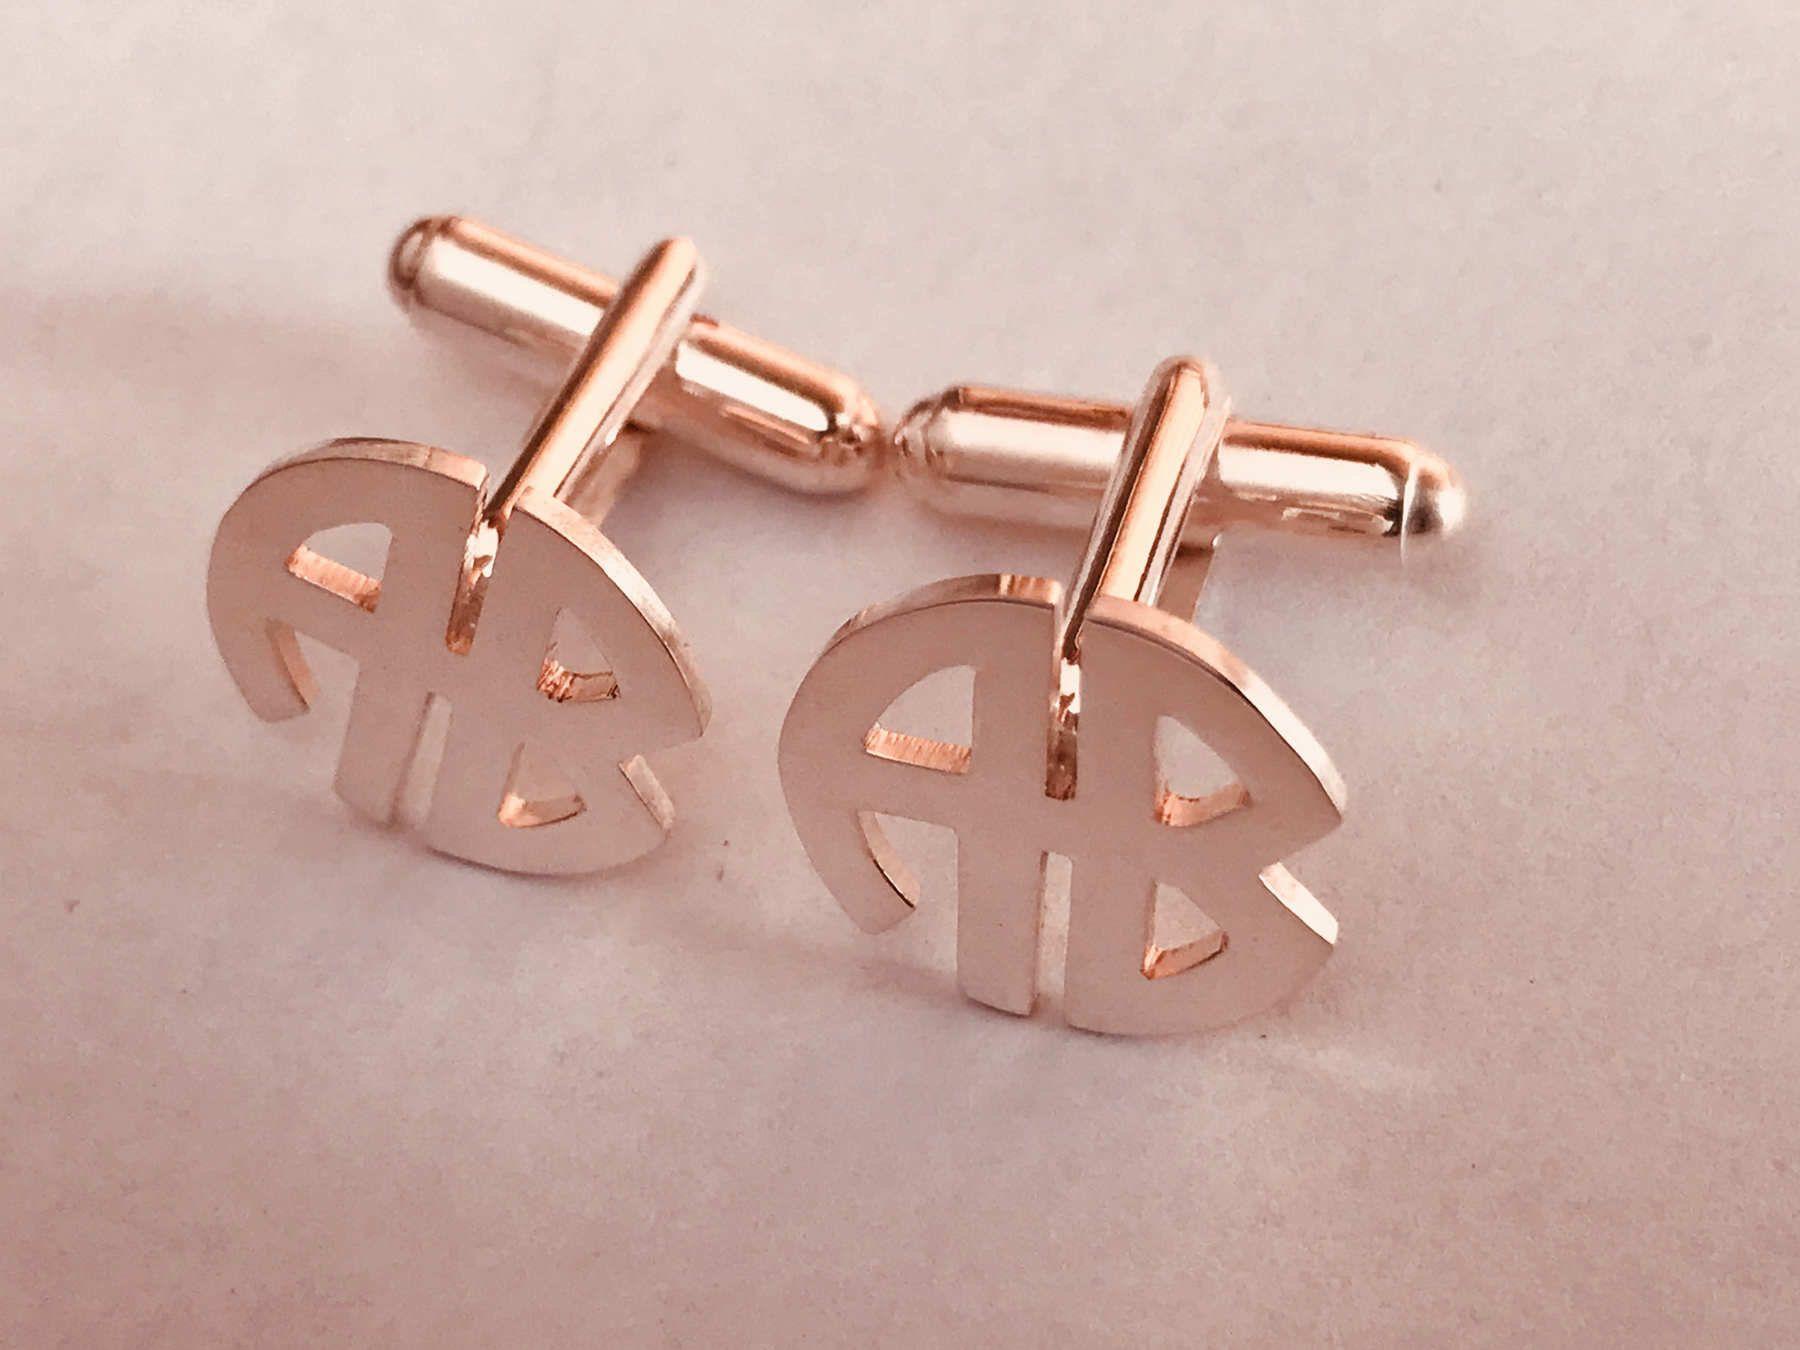 925 silver cufflinks personalized Bespoke Cufflinks for groom Wedding Cufflinks Initials